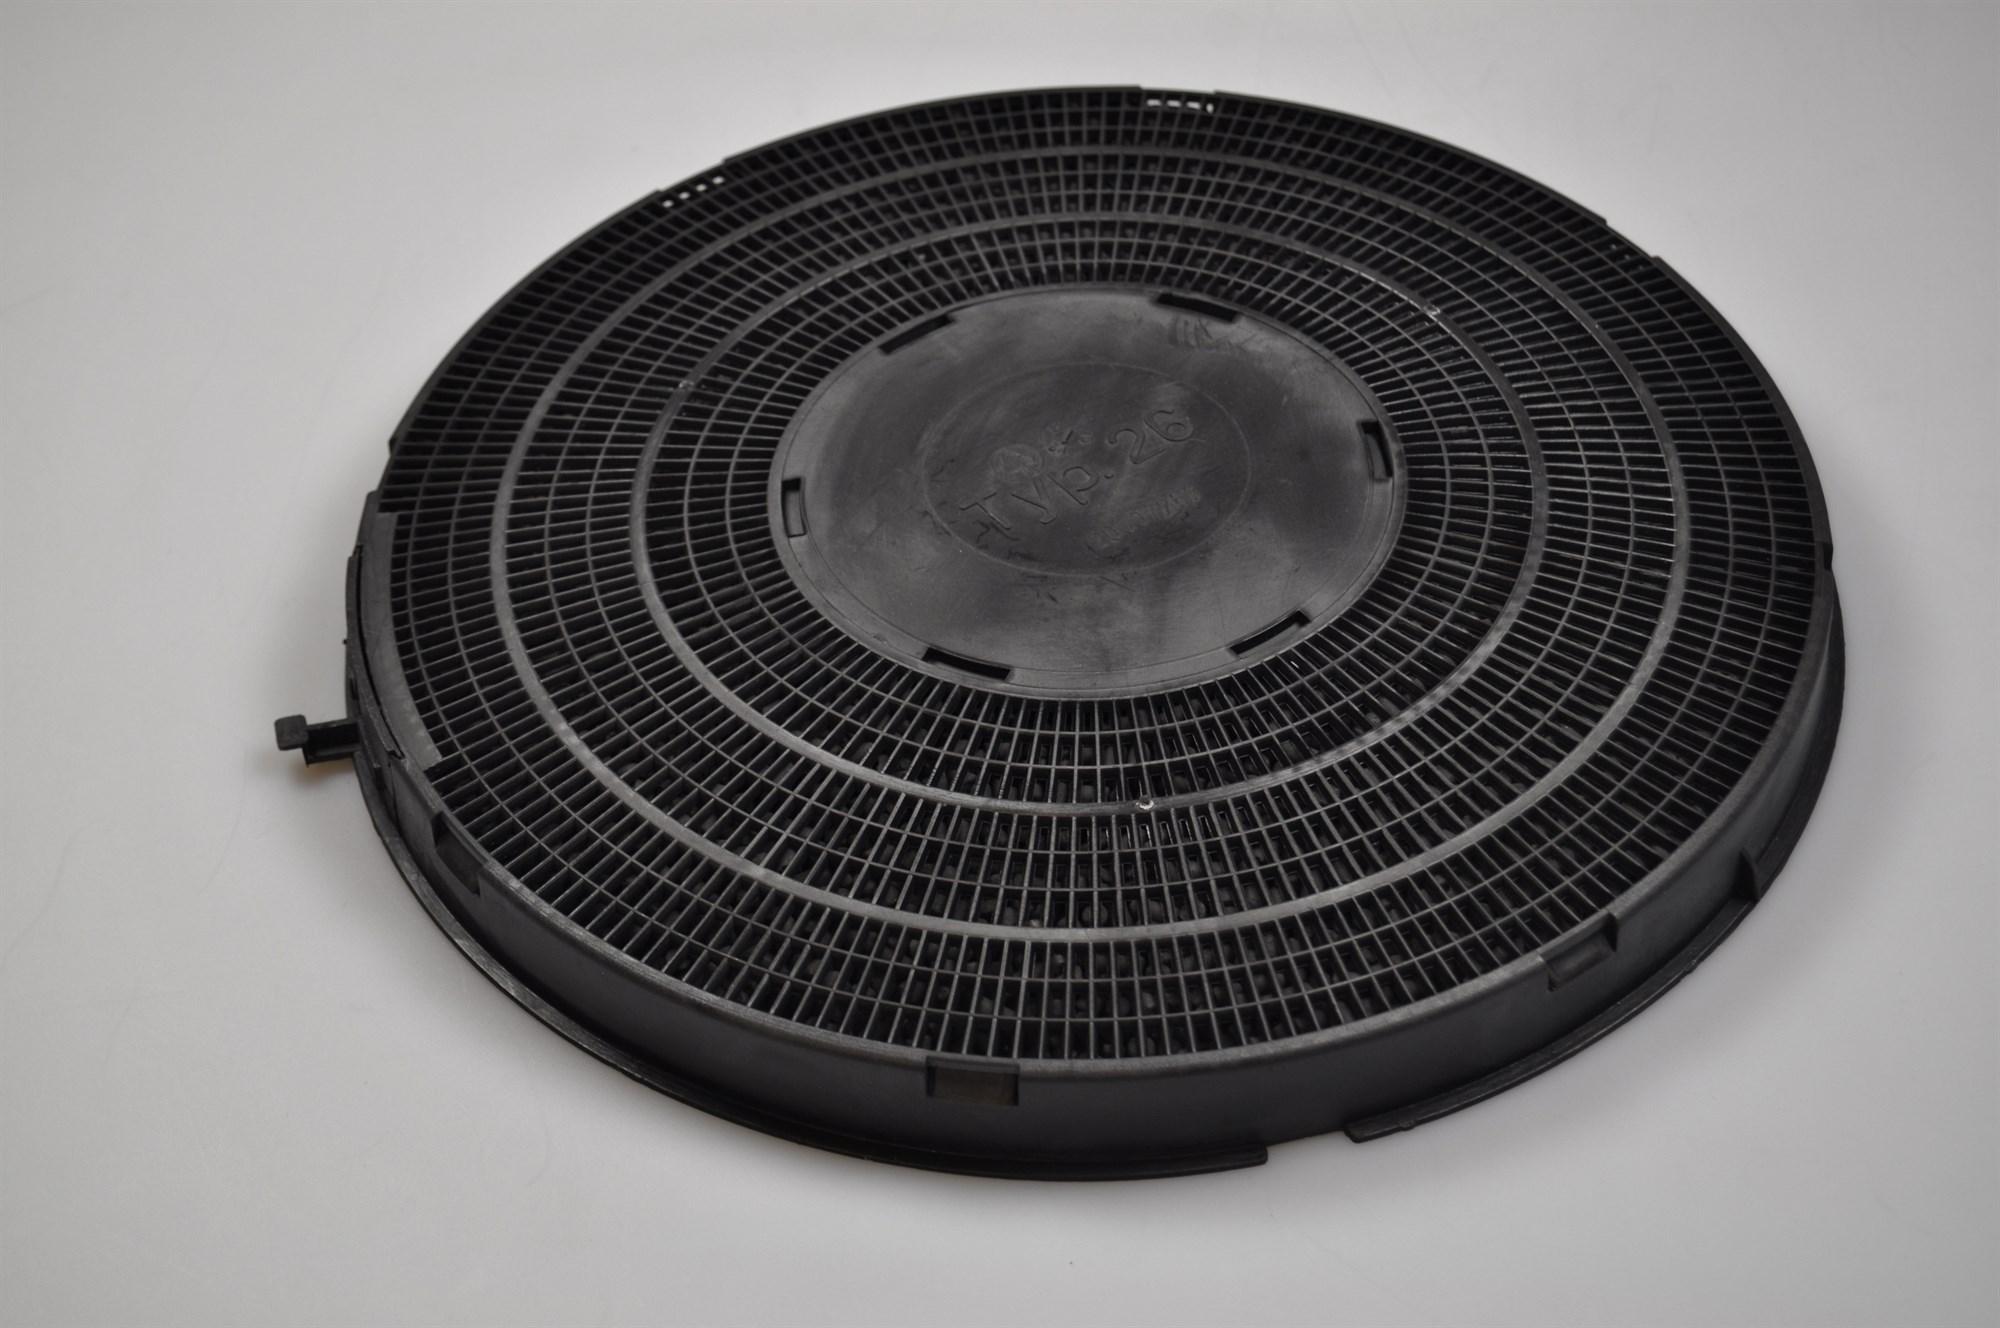 kohlefilter juno dunstabzugshaube 280 mm. Black Bedroom Furniture Sets. Home Design Ideas